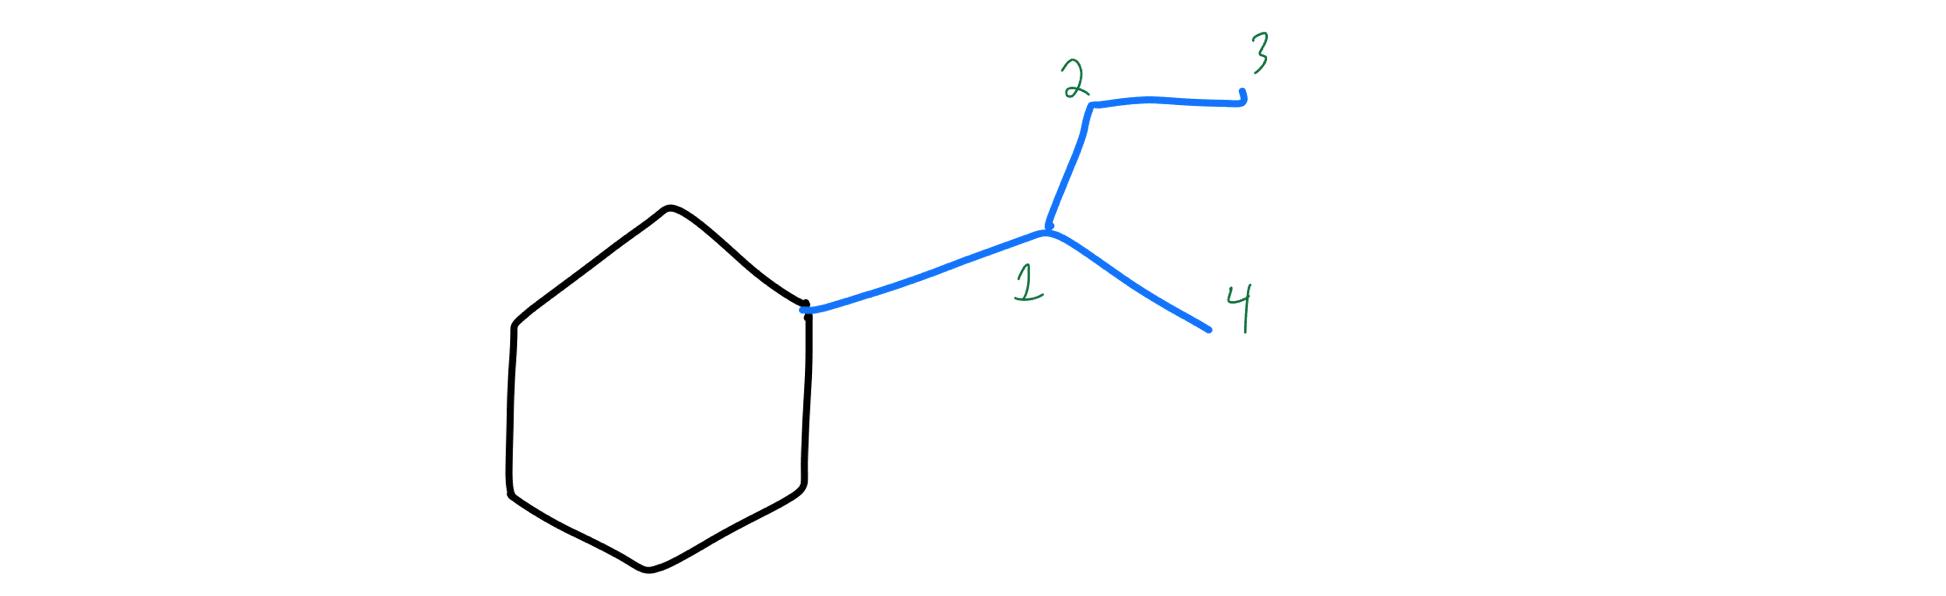 Sec-butyl